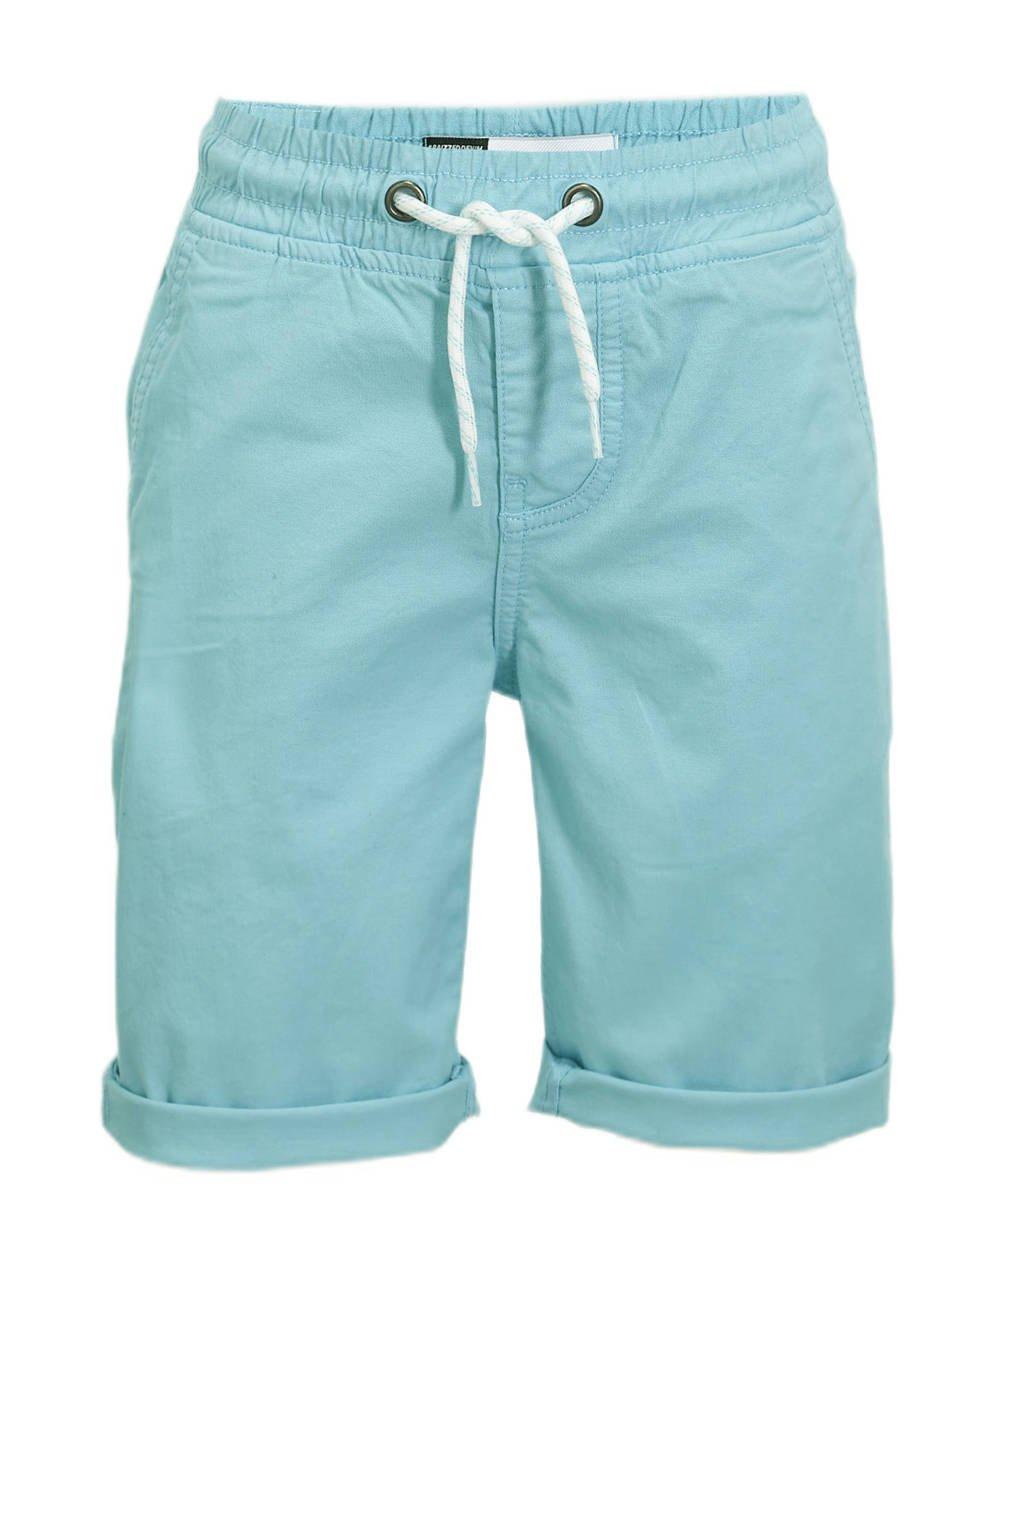 Raizzed regular fit bermuda Roman pastel blauw, Pastel blauw